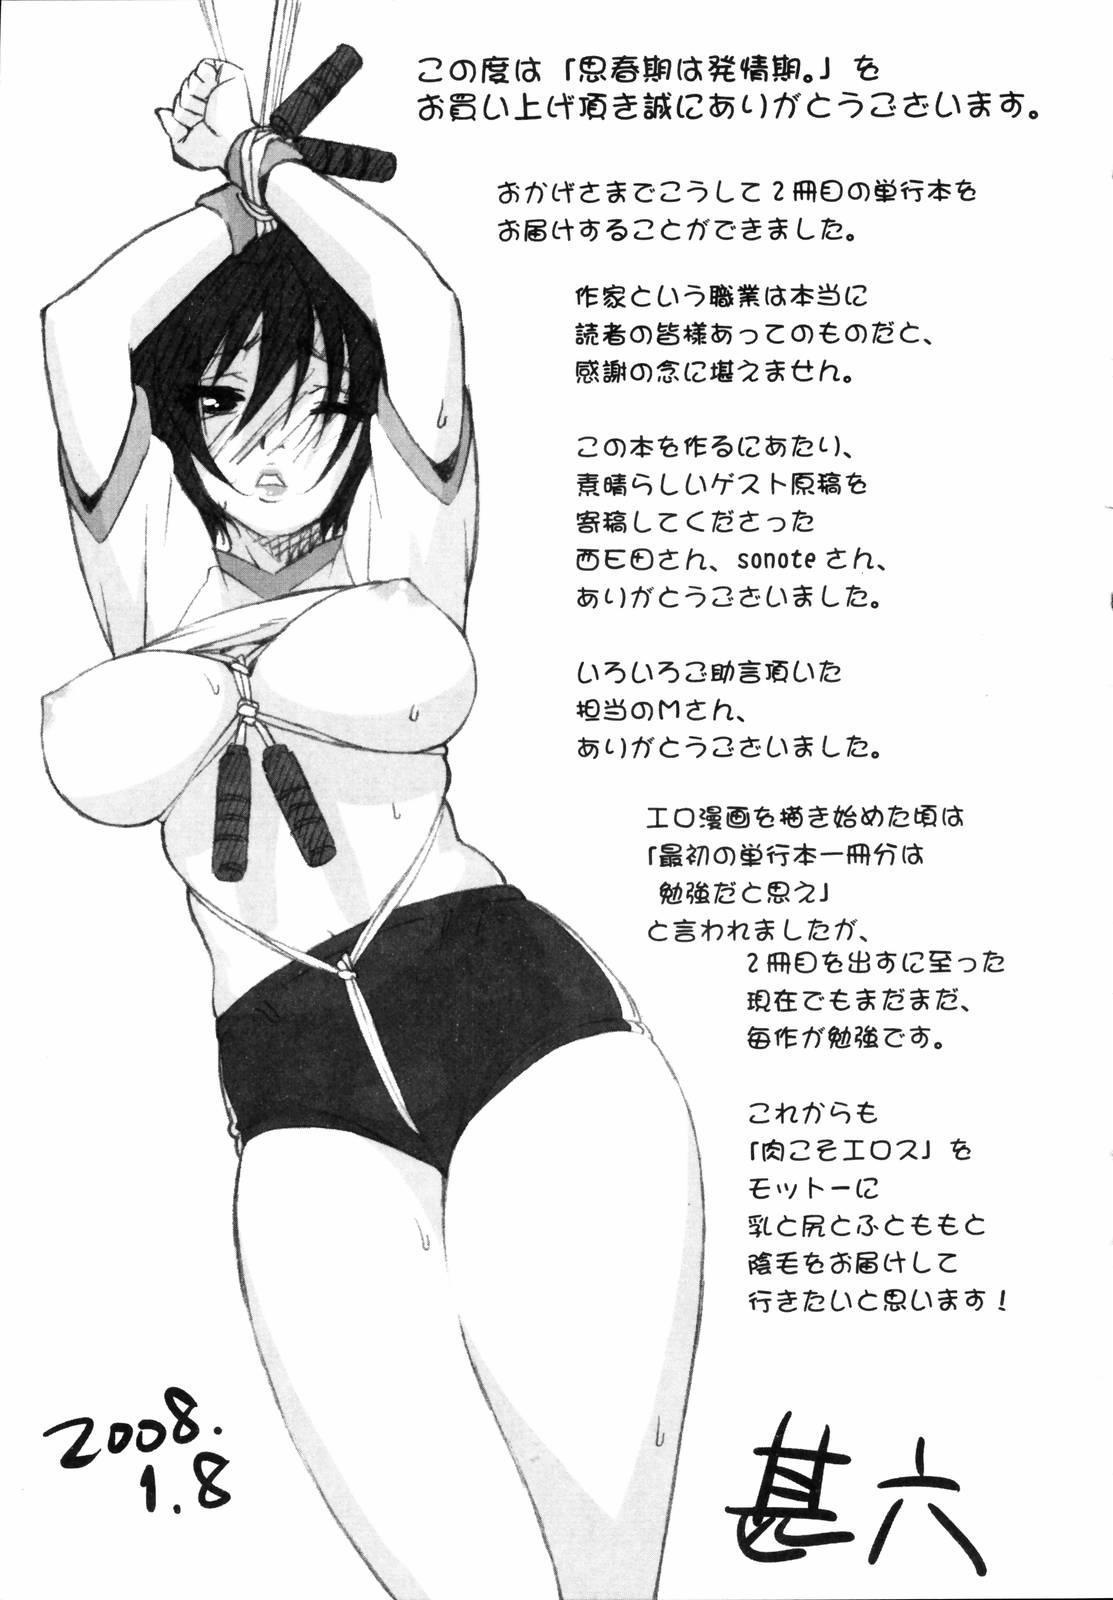 Shishunki wa Hatsujouki - Adolescence is a sexual excitement period. 188